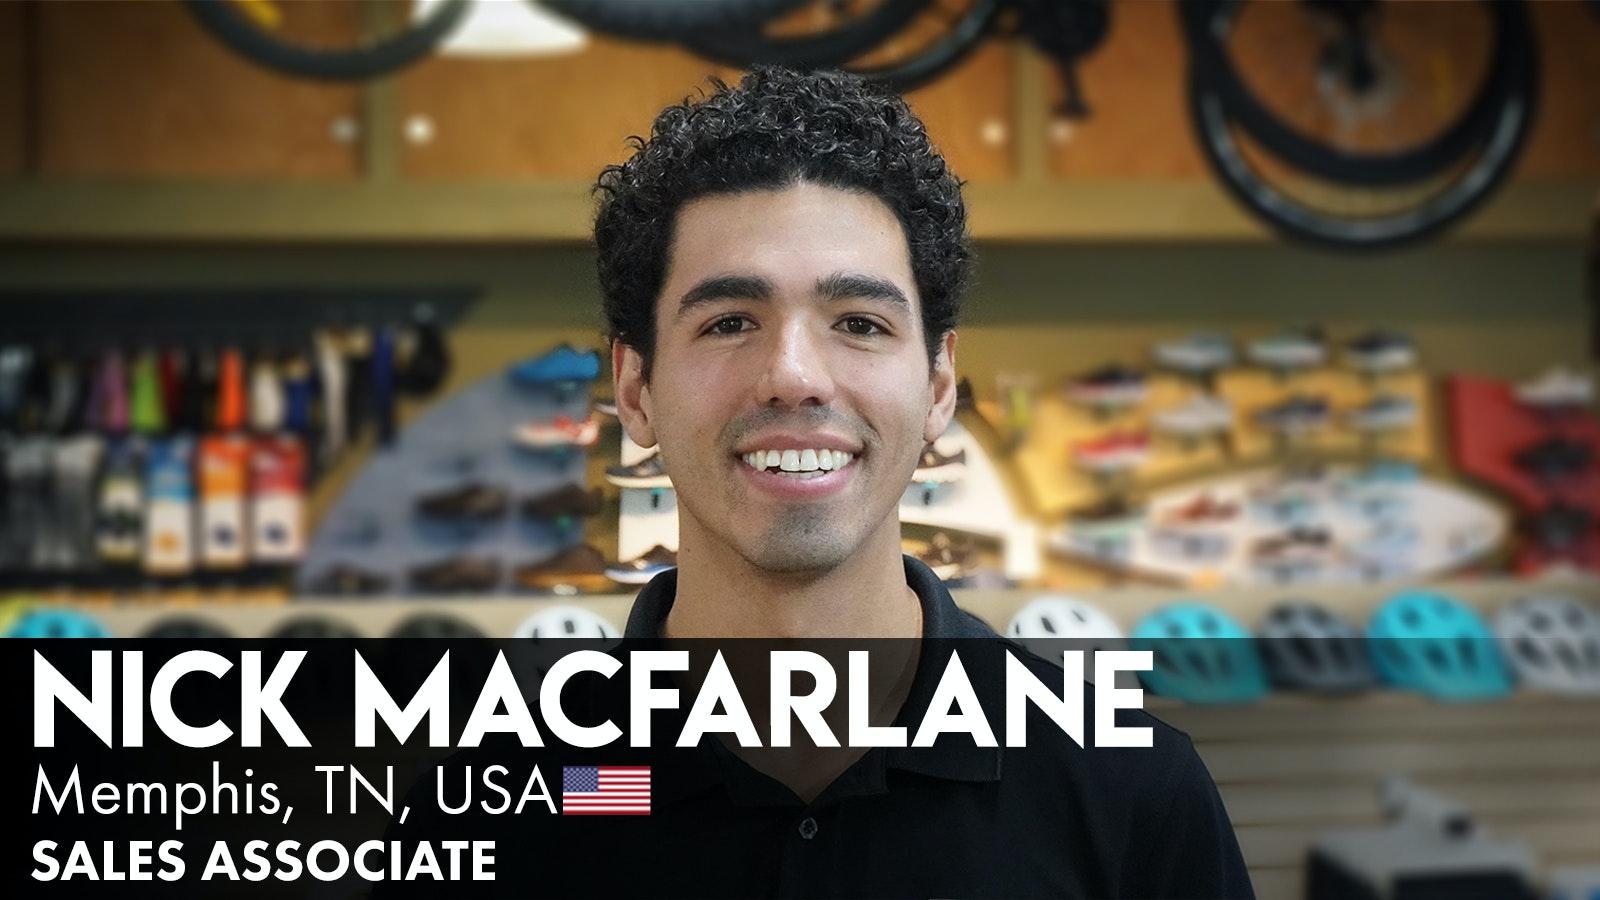 Nick McFarlane